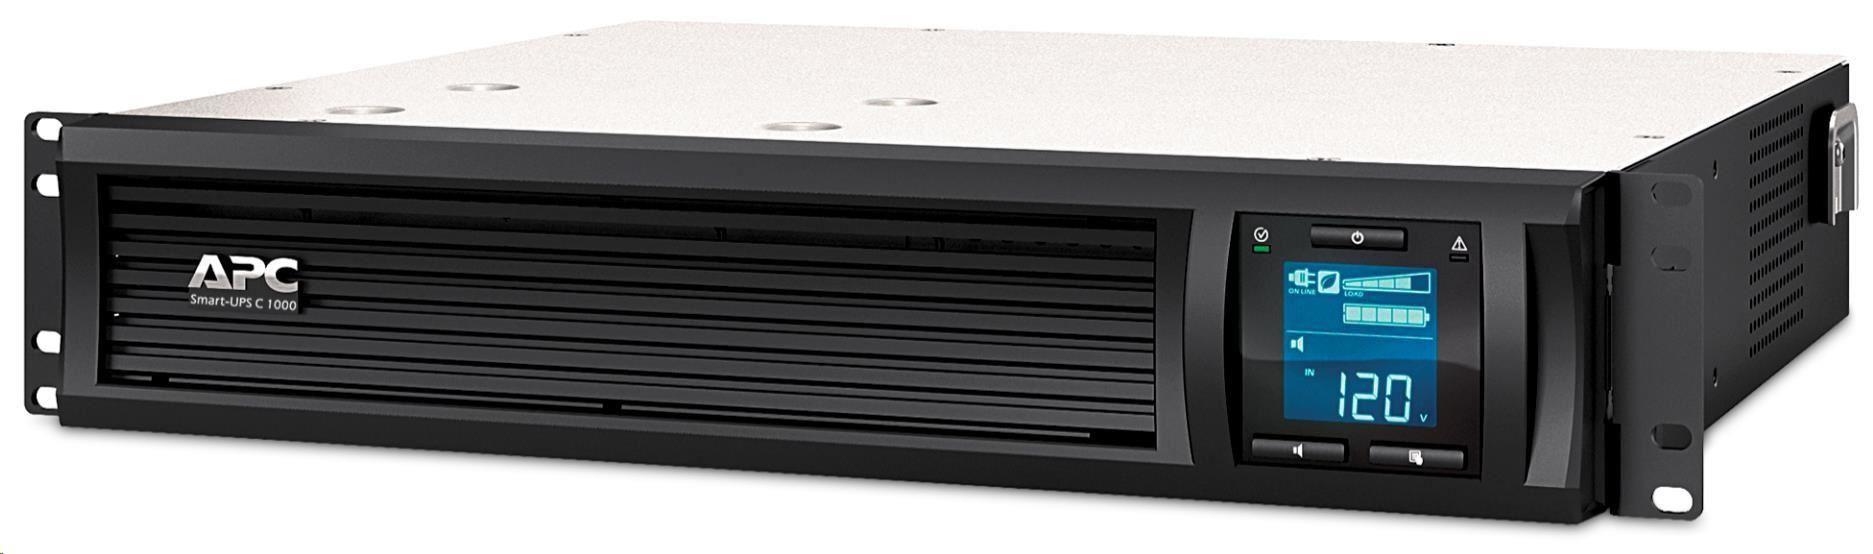 APC Smart-UPS C 1500VA LCD RM 2U 230V with SmartConnect (900W)